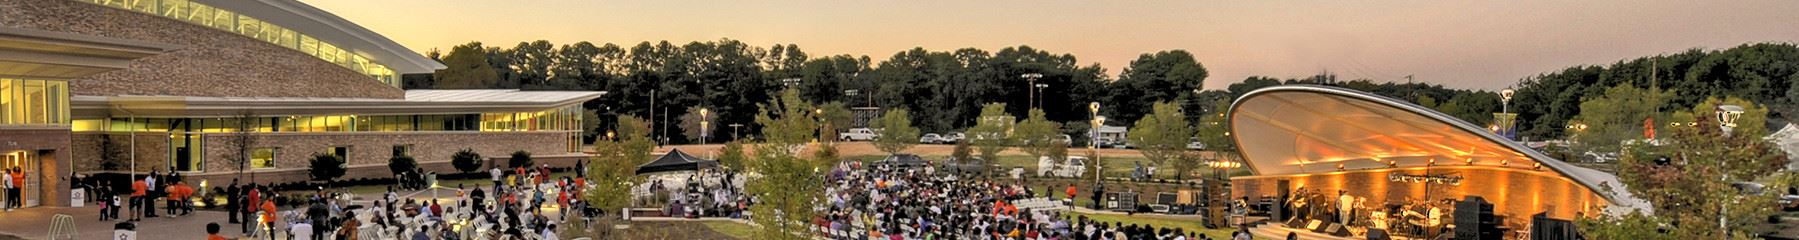 Court Services | Riverdale, GA - Official Website